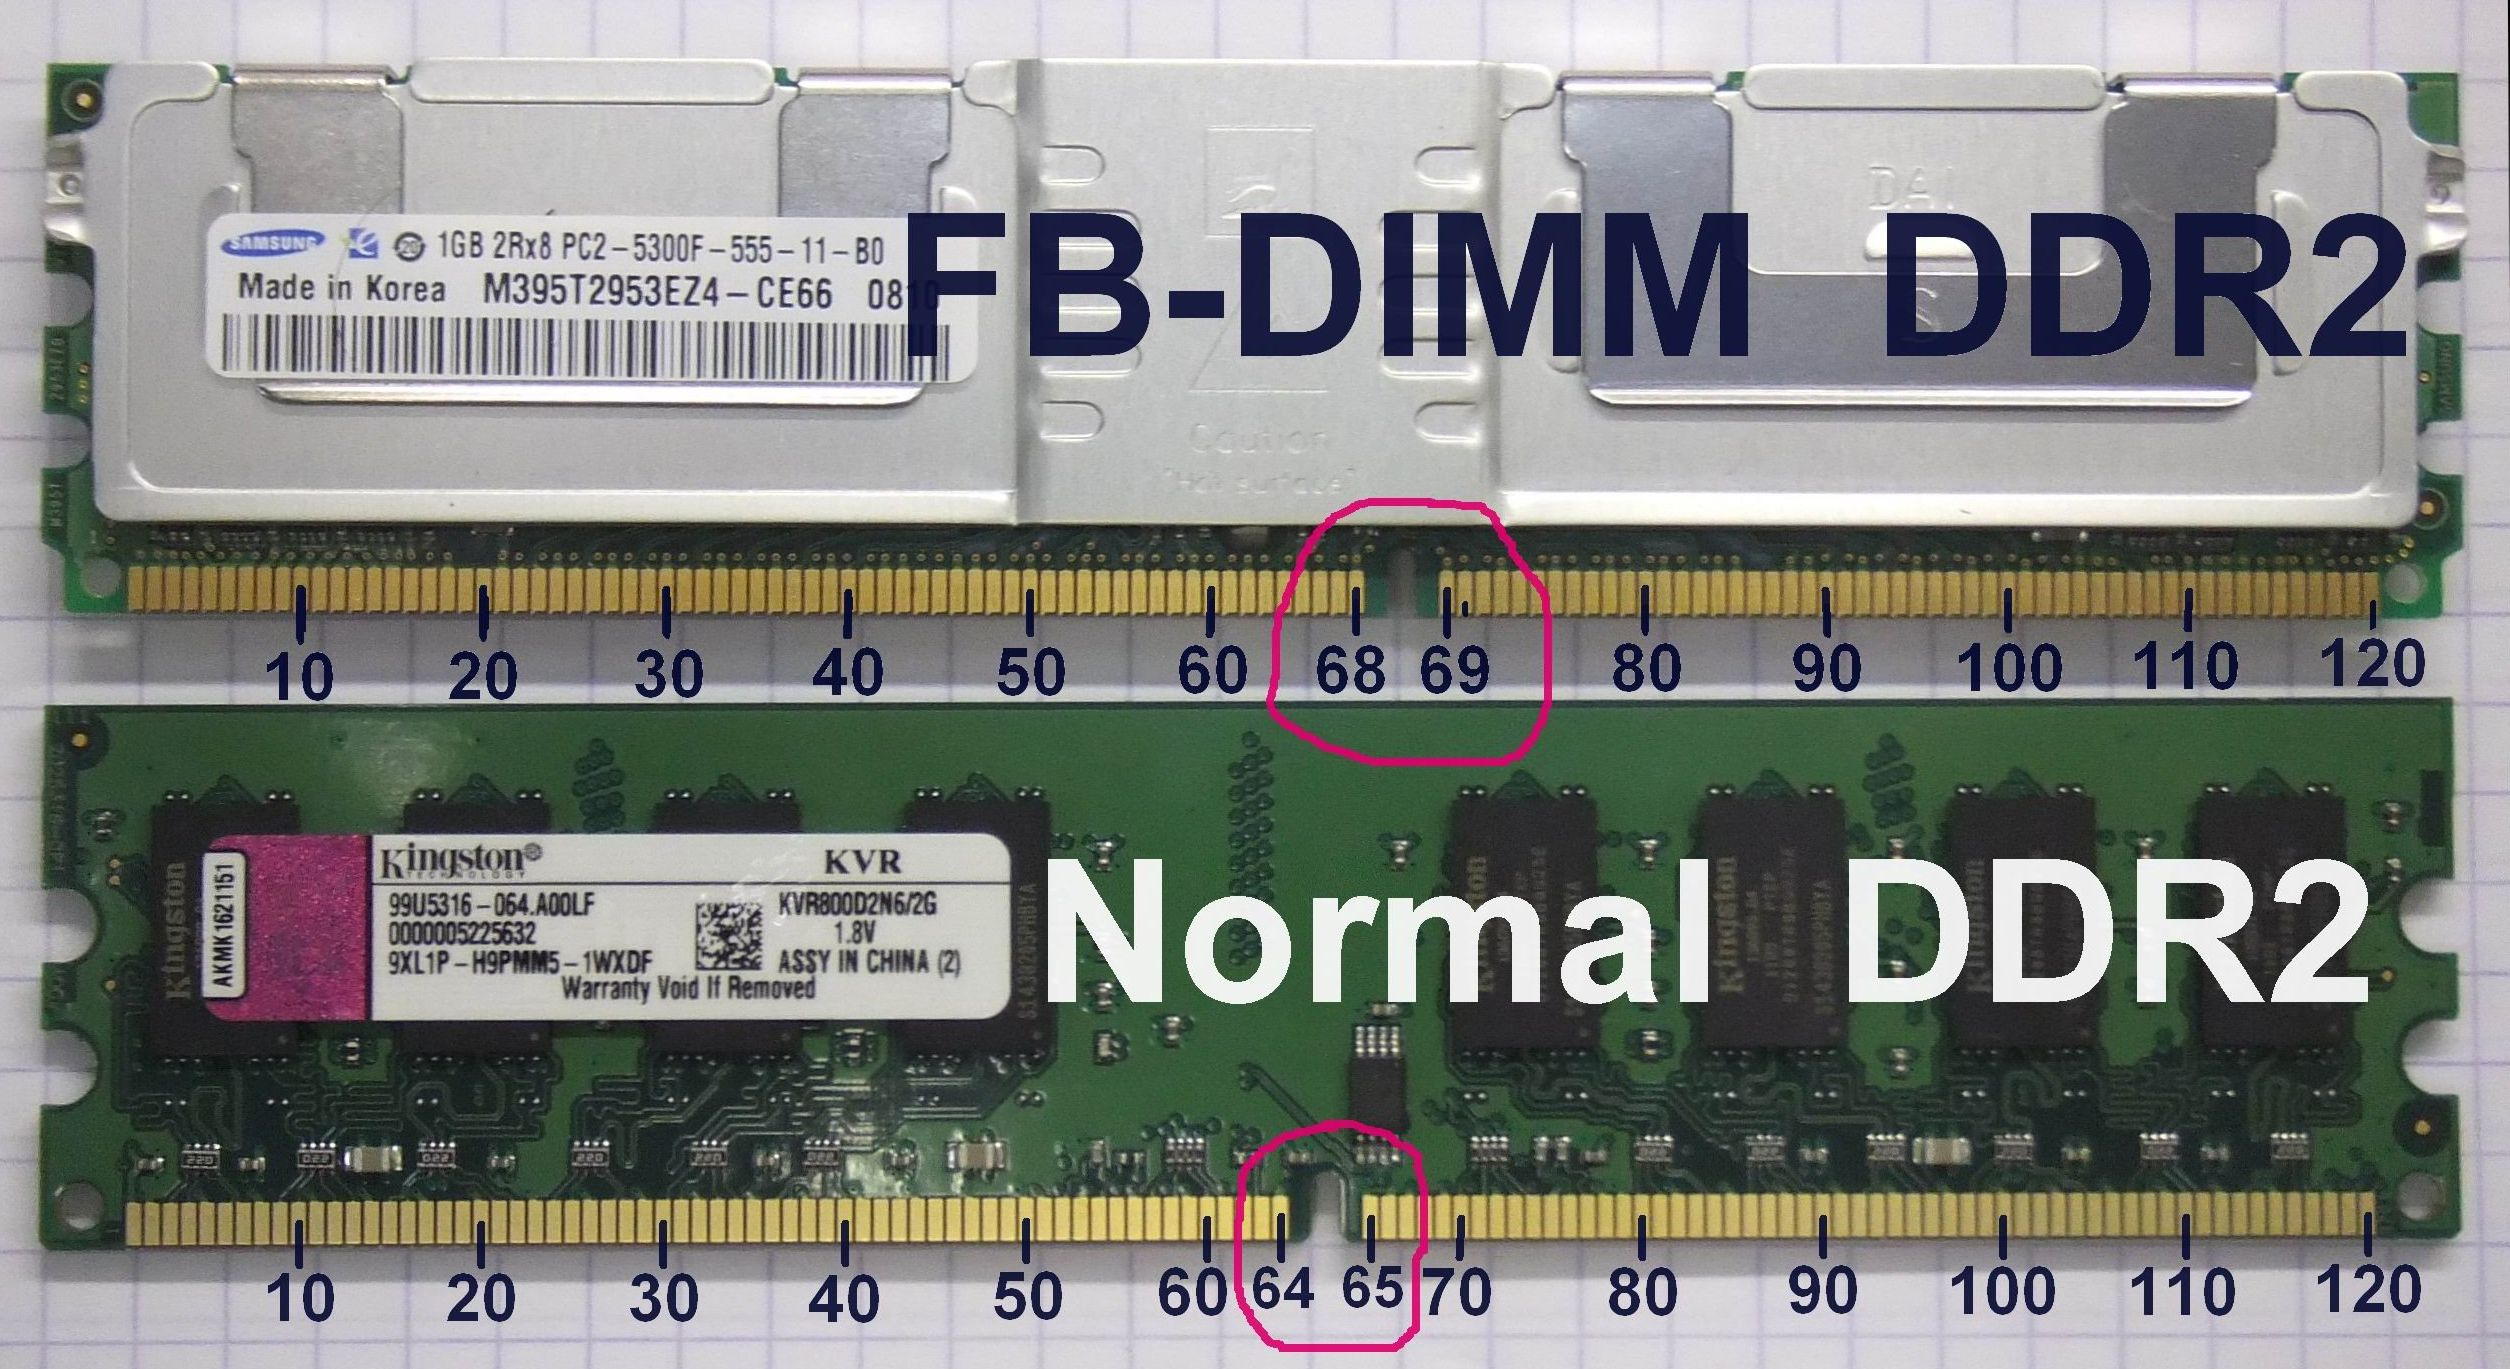 Can I Use Fb Dimm Ddr2 Ram In Casual Desktopgigabyte P35 Ds3 Ver10 Xeon 5450 30ghz